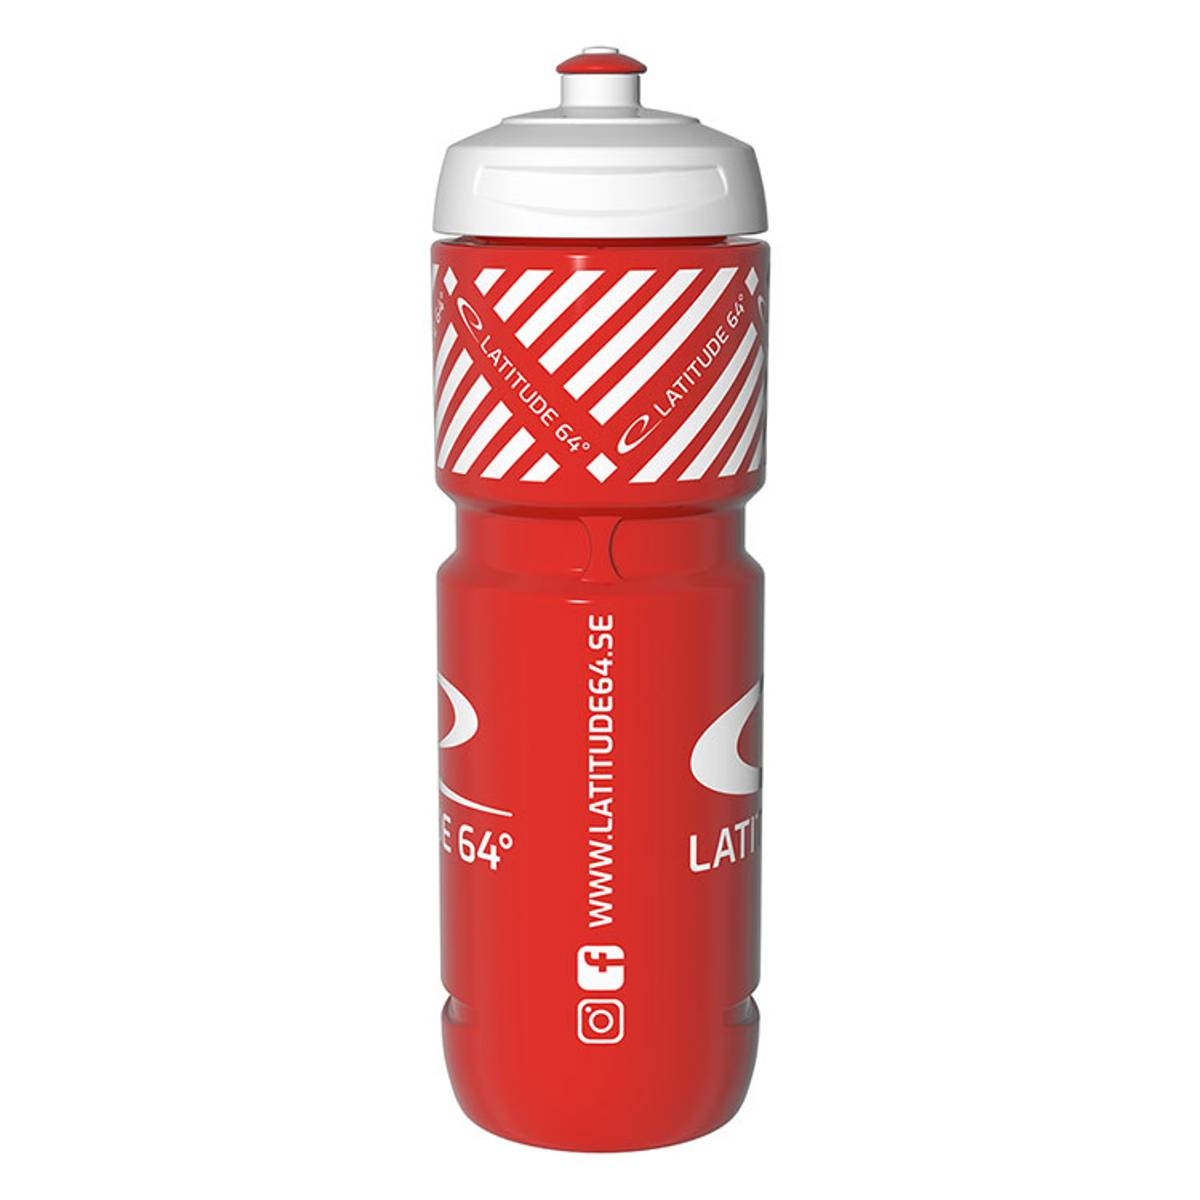 Latitude 64 Water Bottle 800 ml